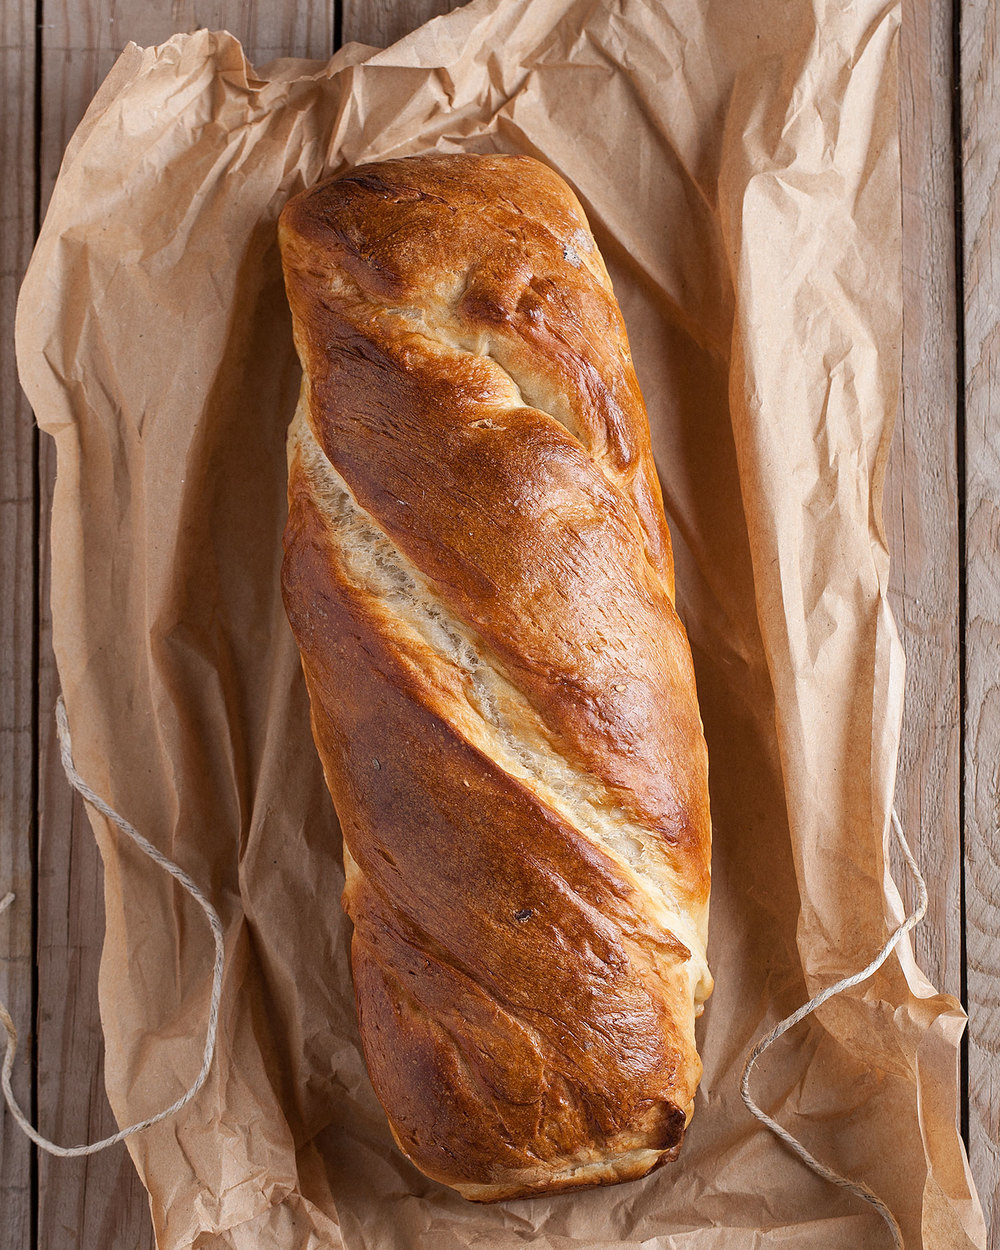 corina-landa-food-photography-fotografia-gastronomica-50.jpg